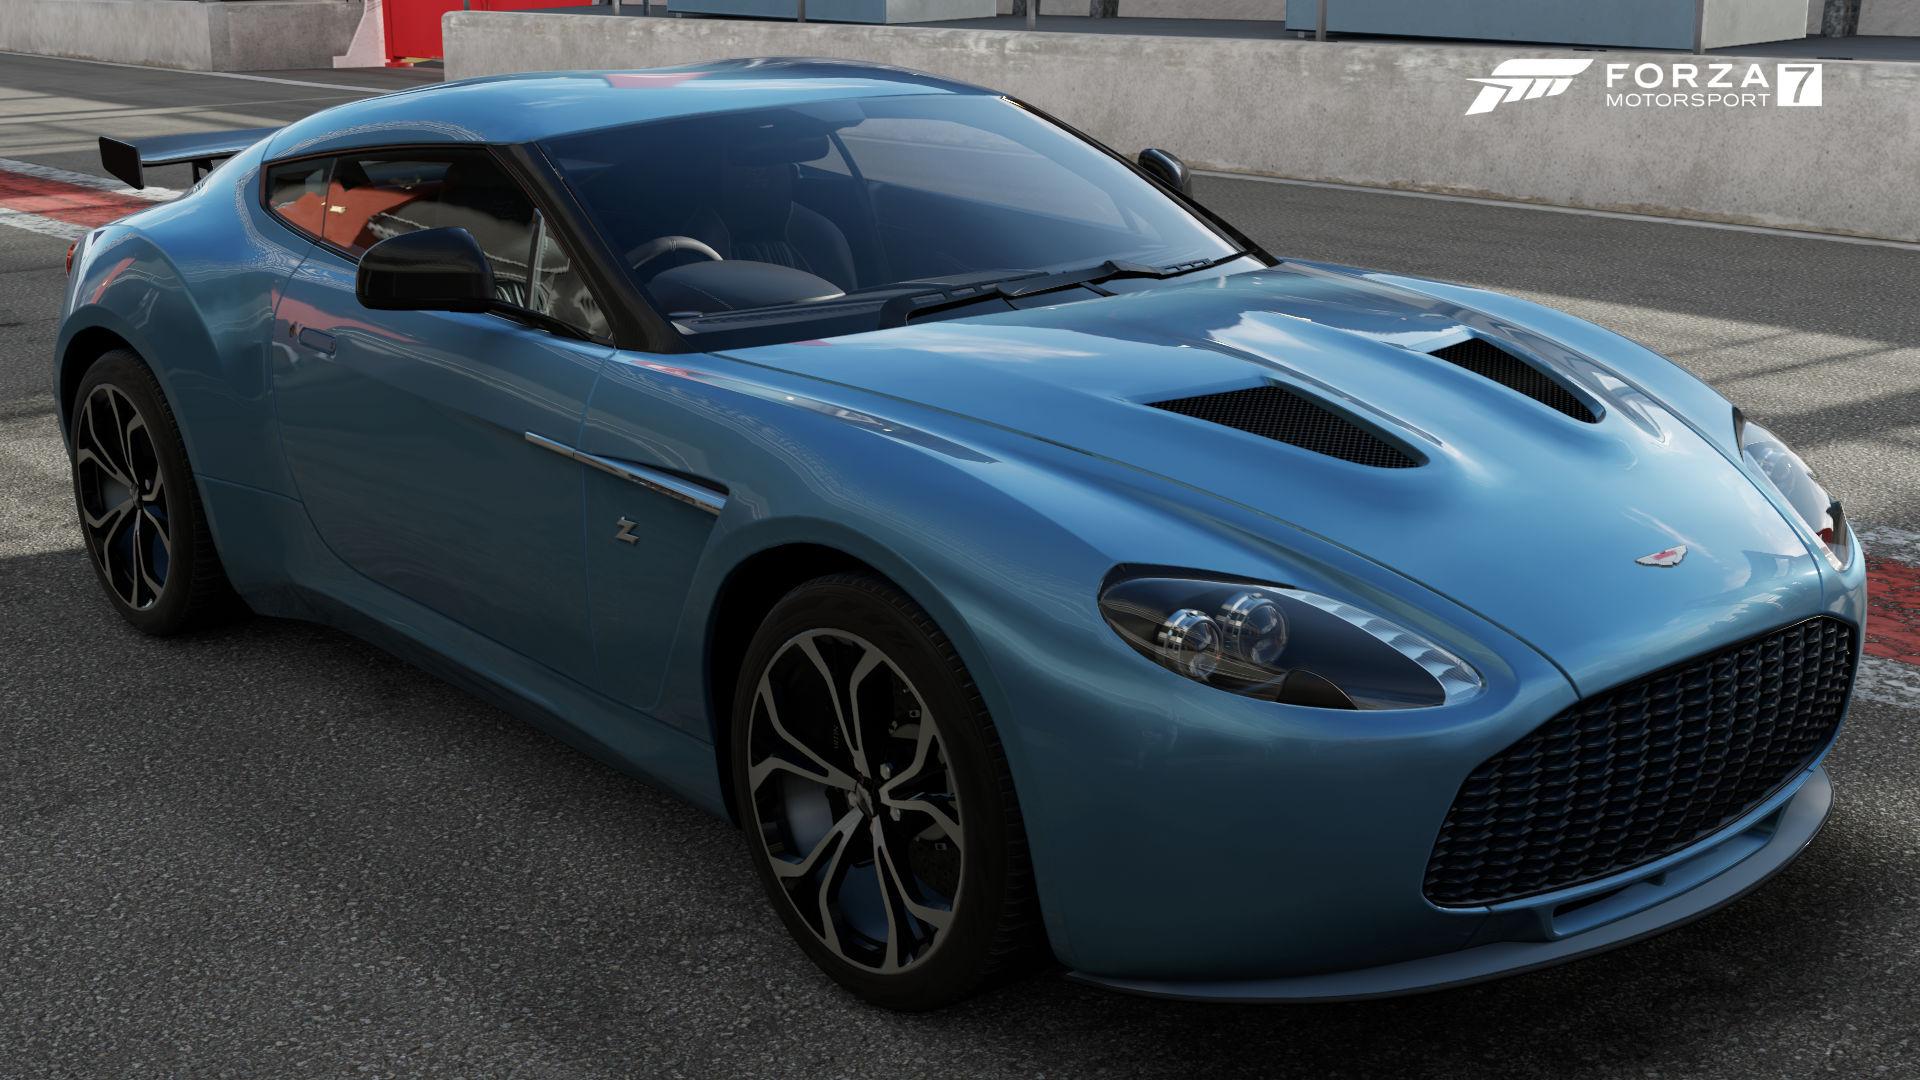 Aston Martin V Zagato Forza Motorsport Wiki FANDOM Powered By - New aston martin zagato